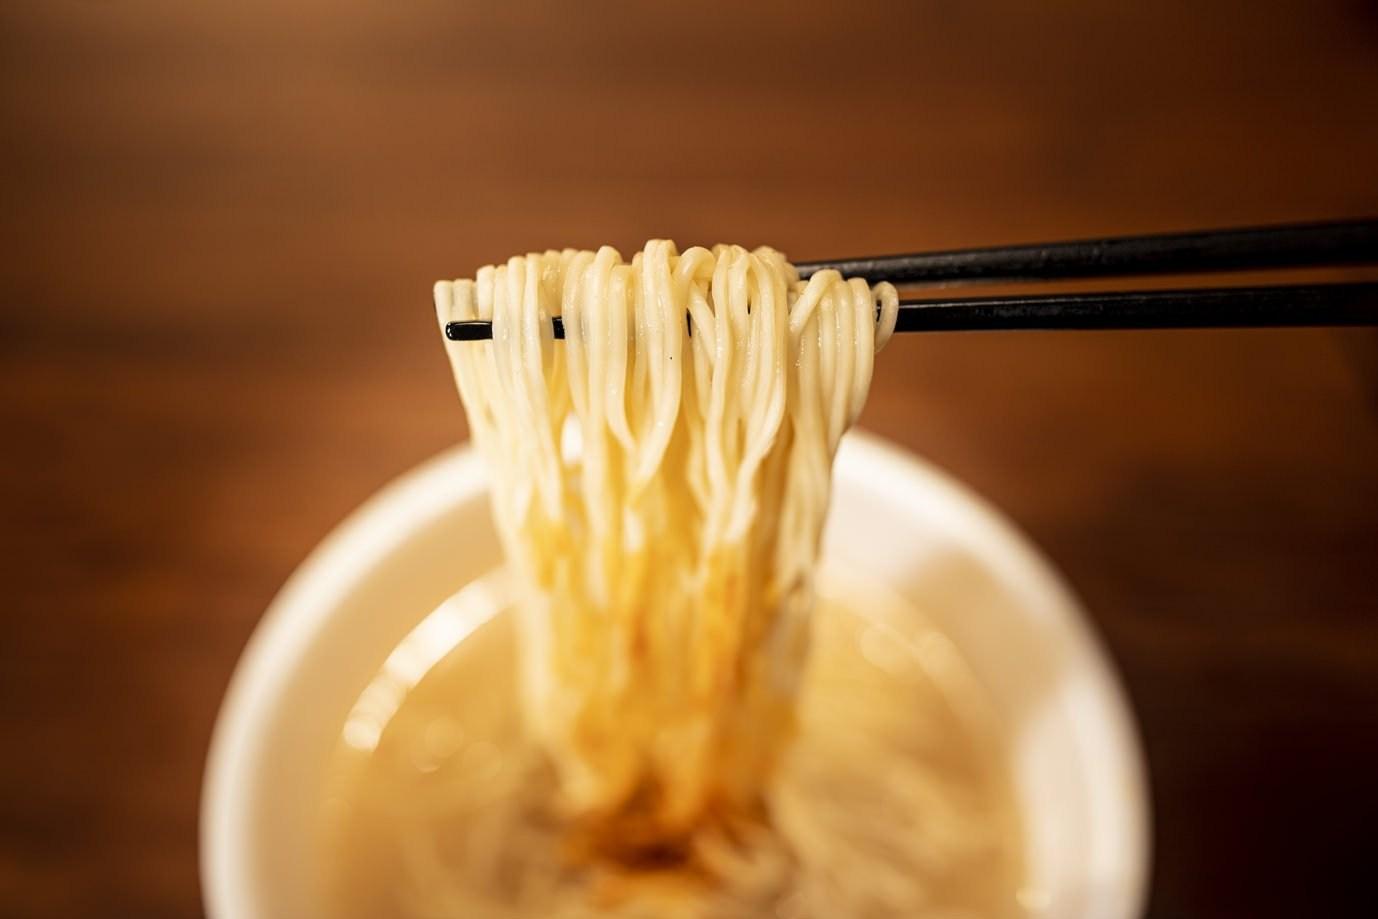 Ichiran-Ramen-instant-noodles-tonkotsu-Japan-food-Japanese-news-03.jpg